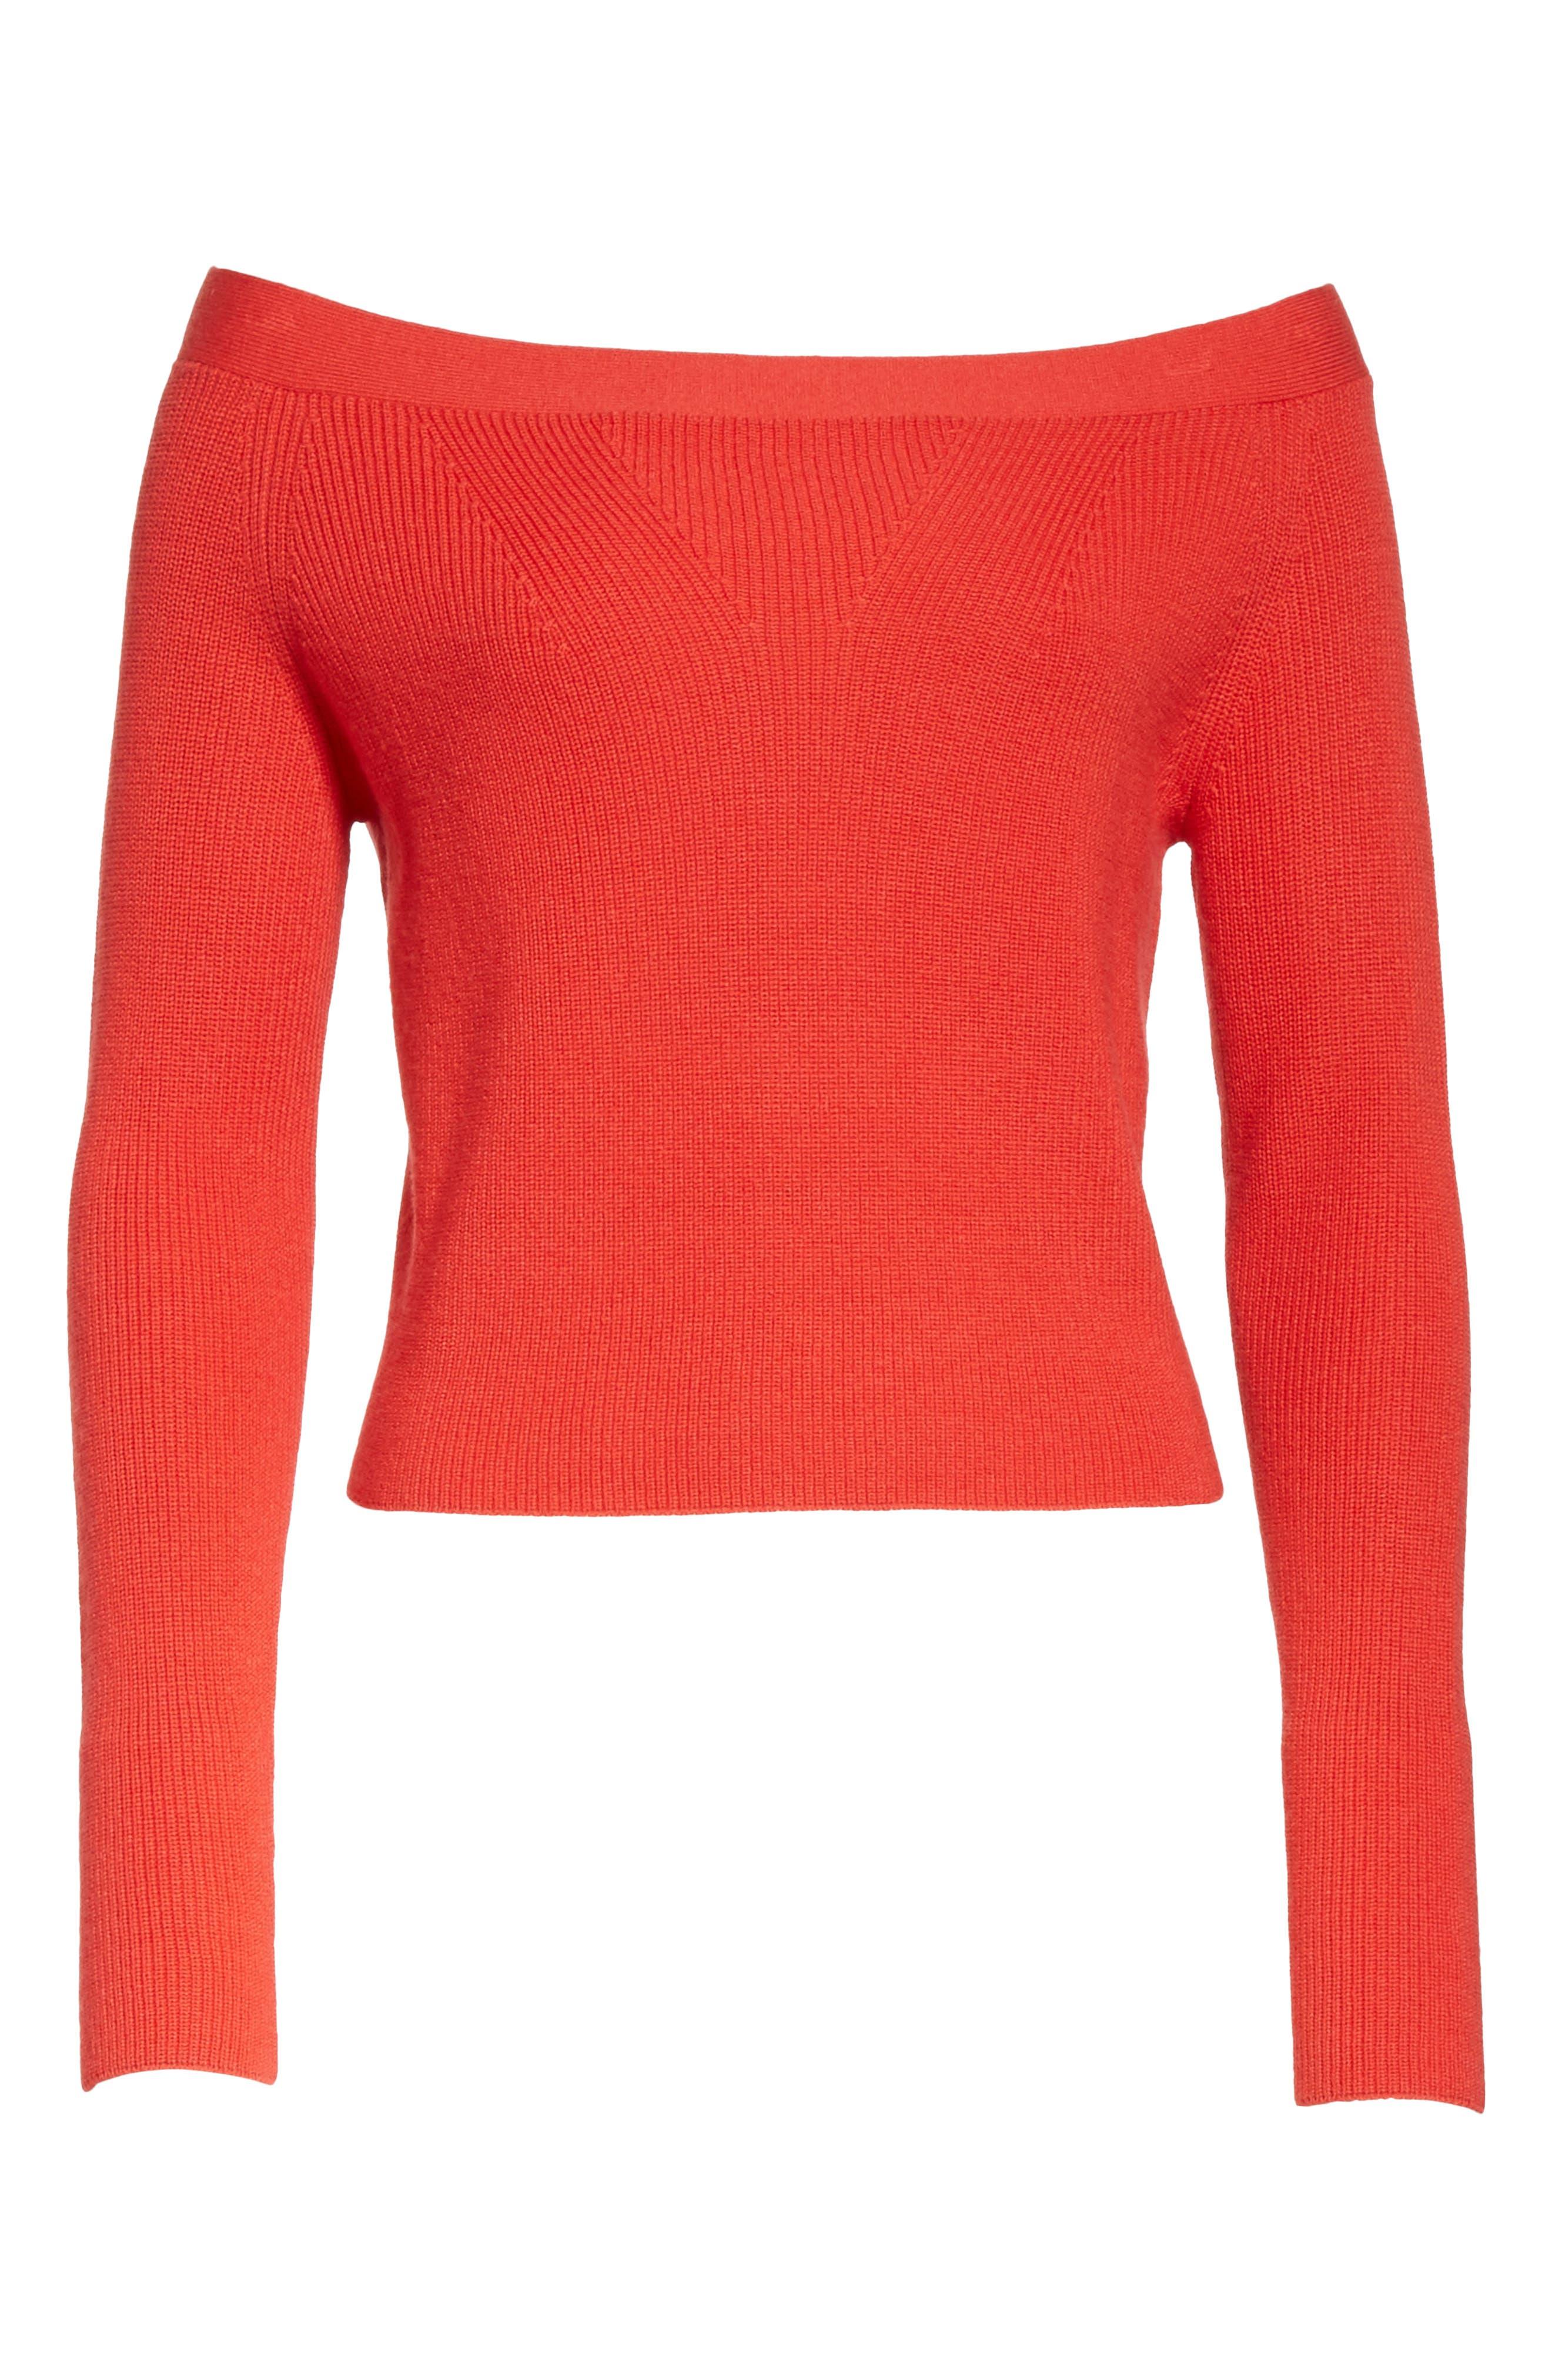 Off the Shoulder Crop Sweater,                             Alternate thumbnail 6, color,                             600